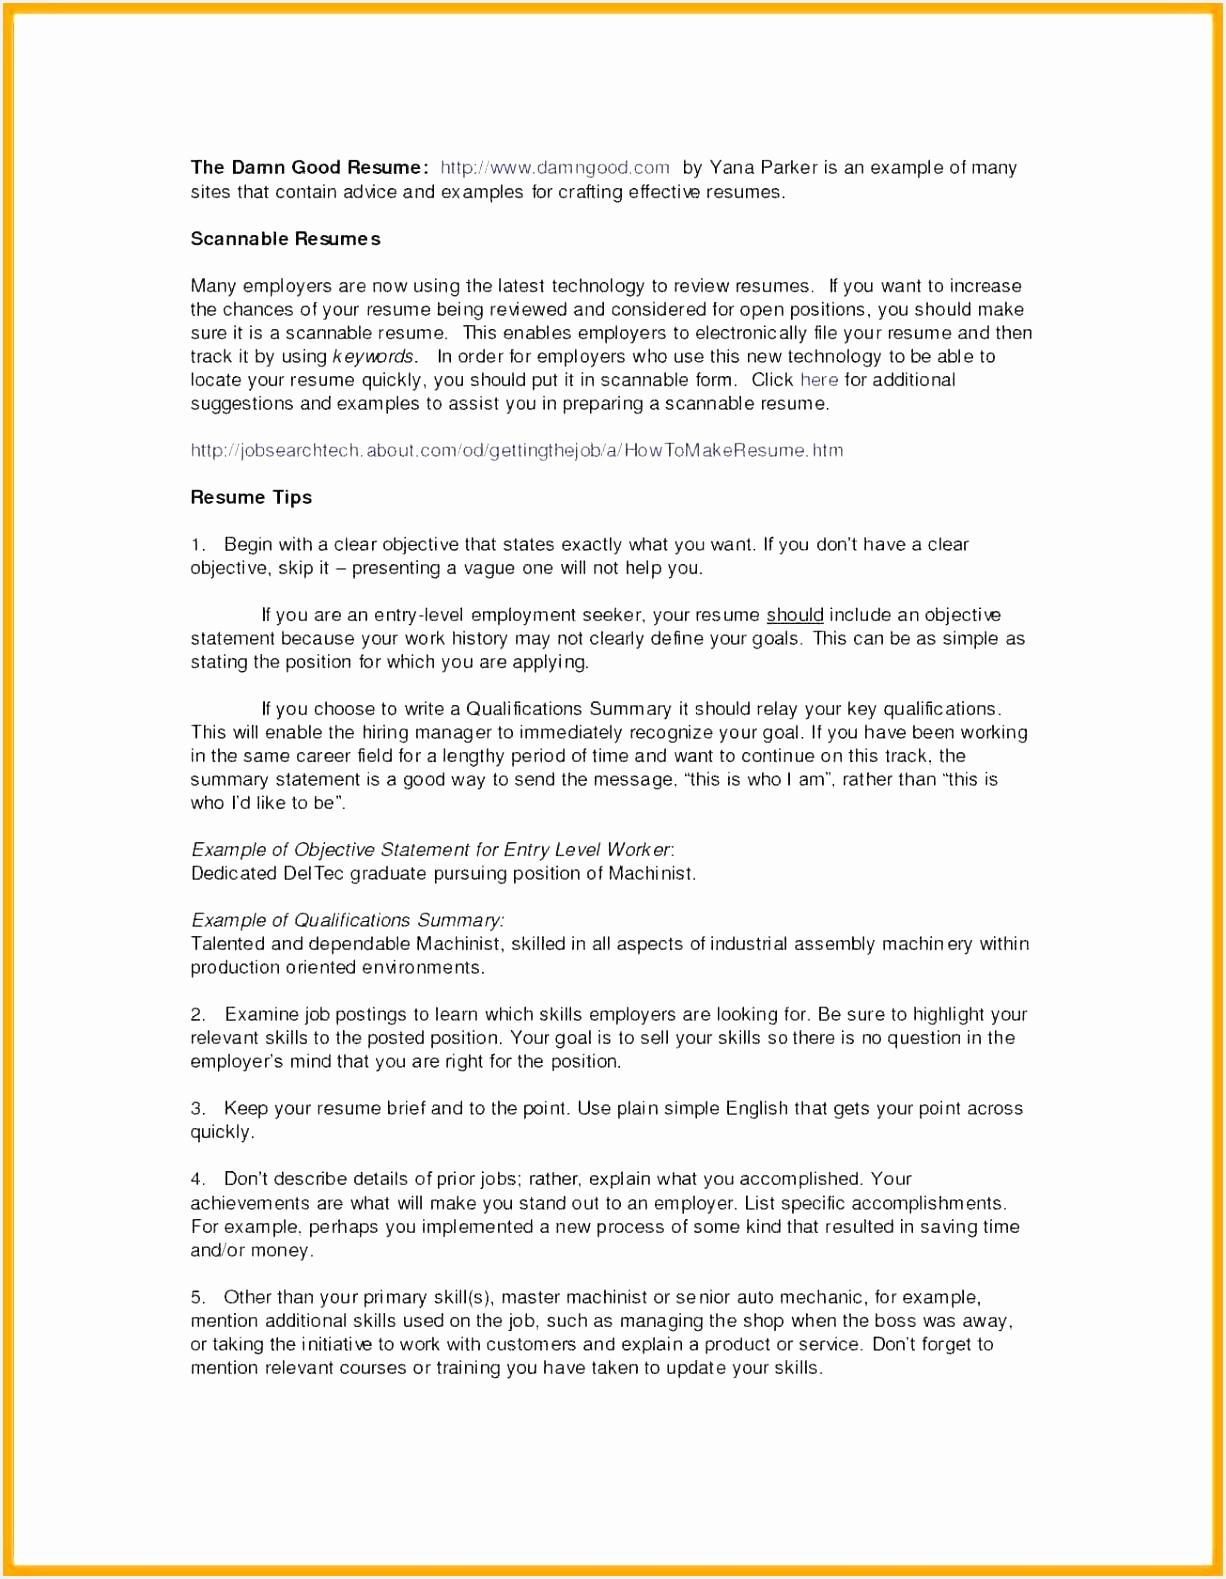 nursing assistant resume skills sample 23 certified nursing assistant resume sample of nursing assistant resume skills 15791226scgkn